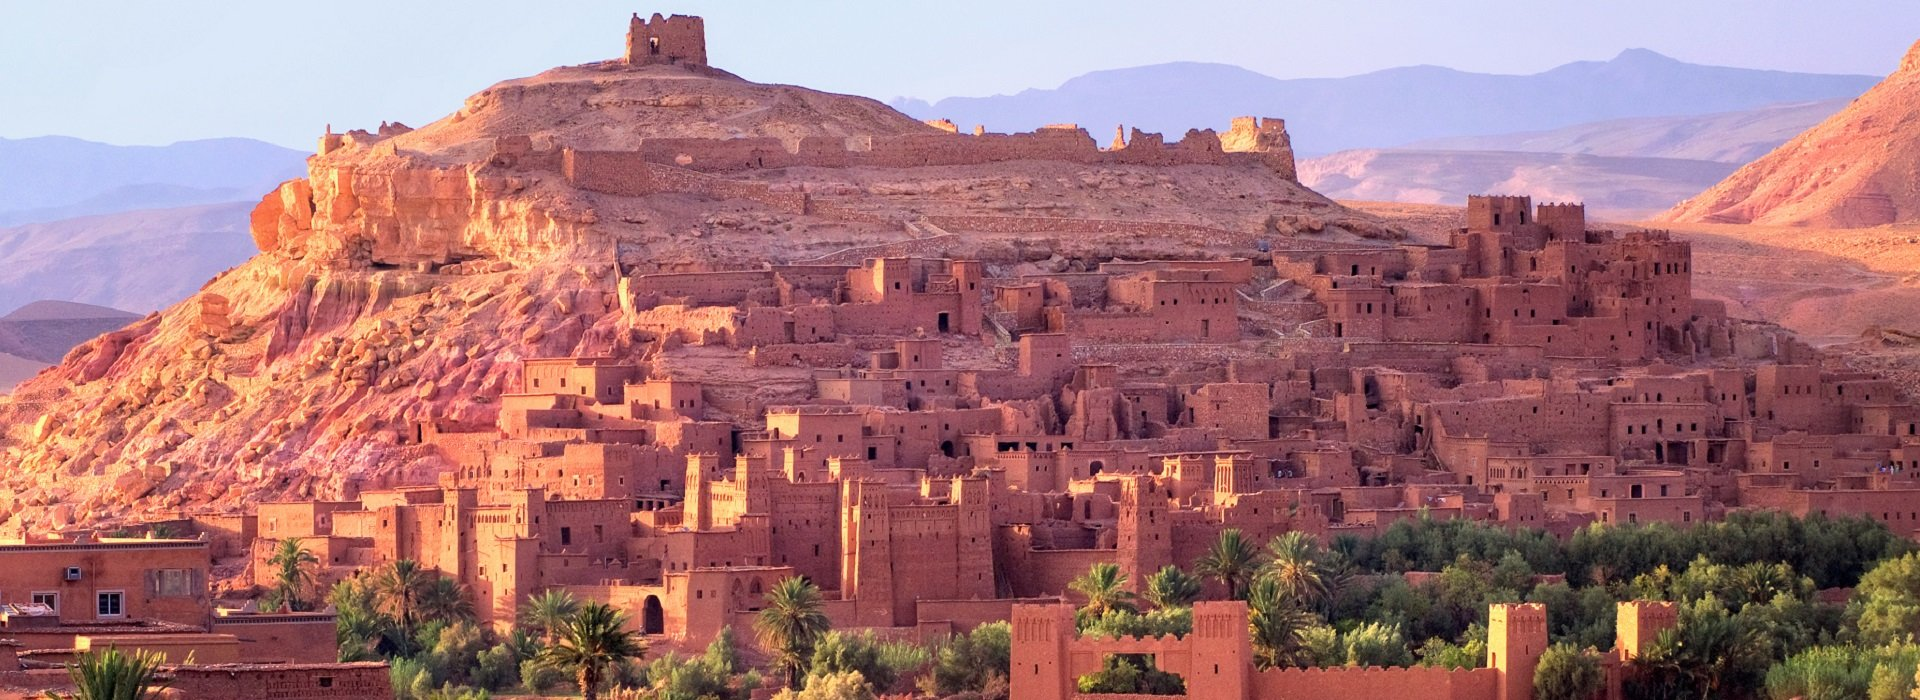 ait_benhaddou_marocco